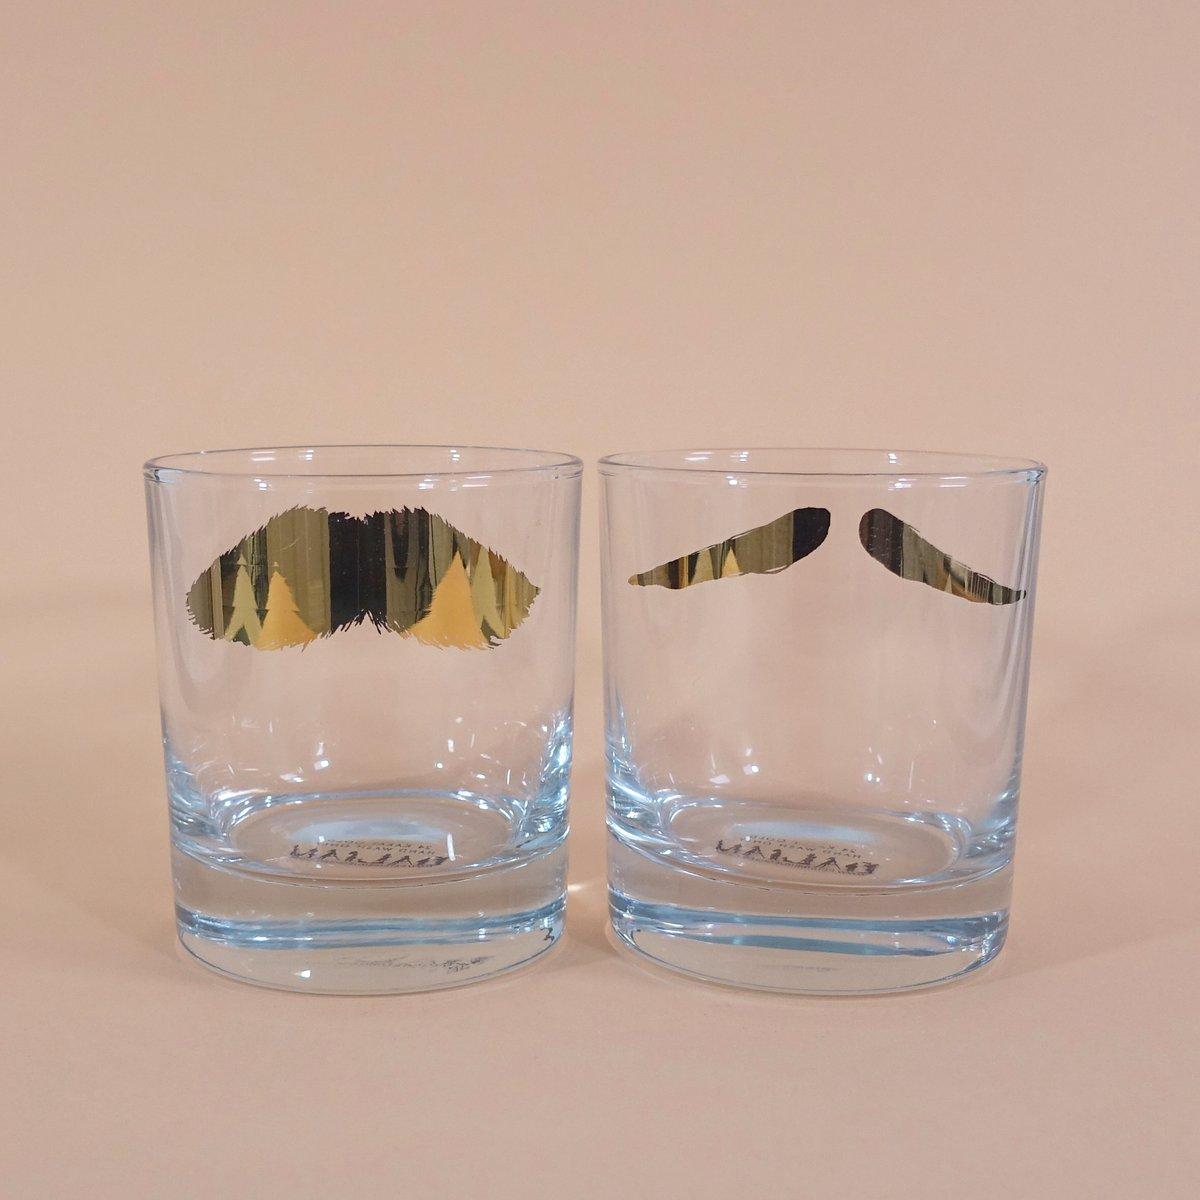 Image of Mustafa & Maurice Golden Moustache Tumbler - Set of 2